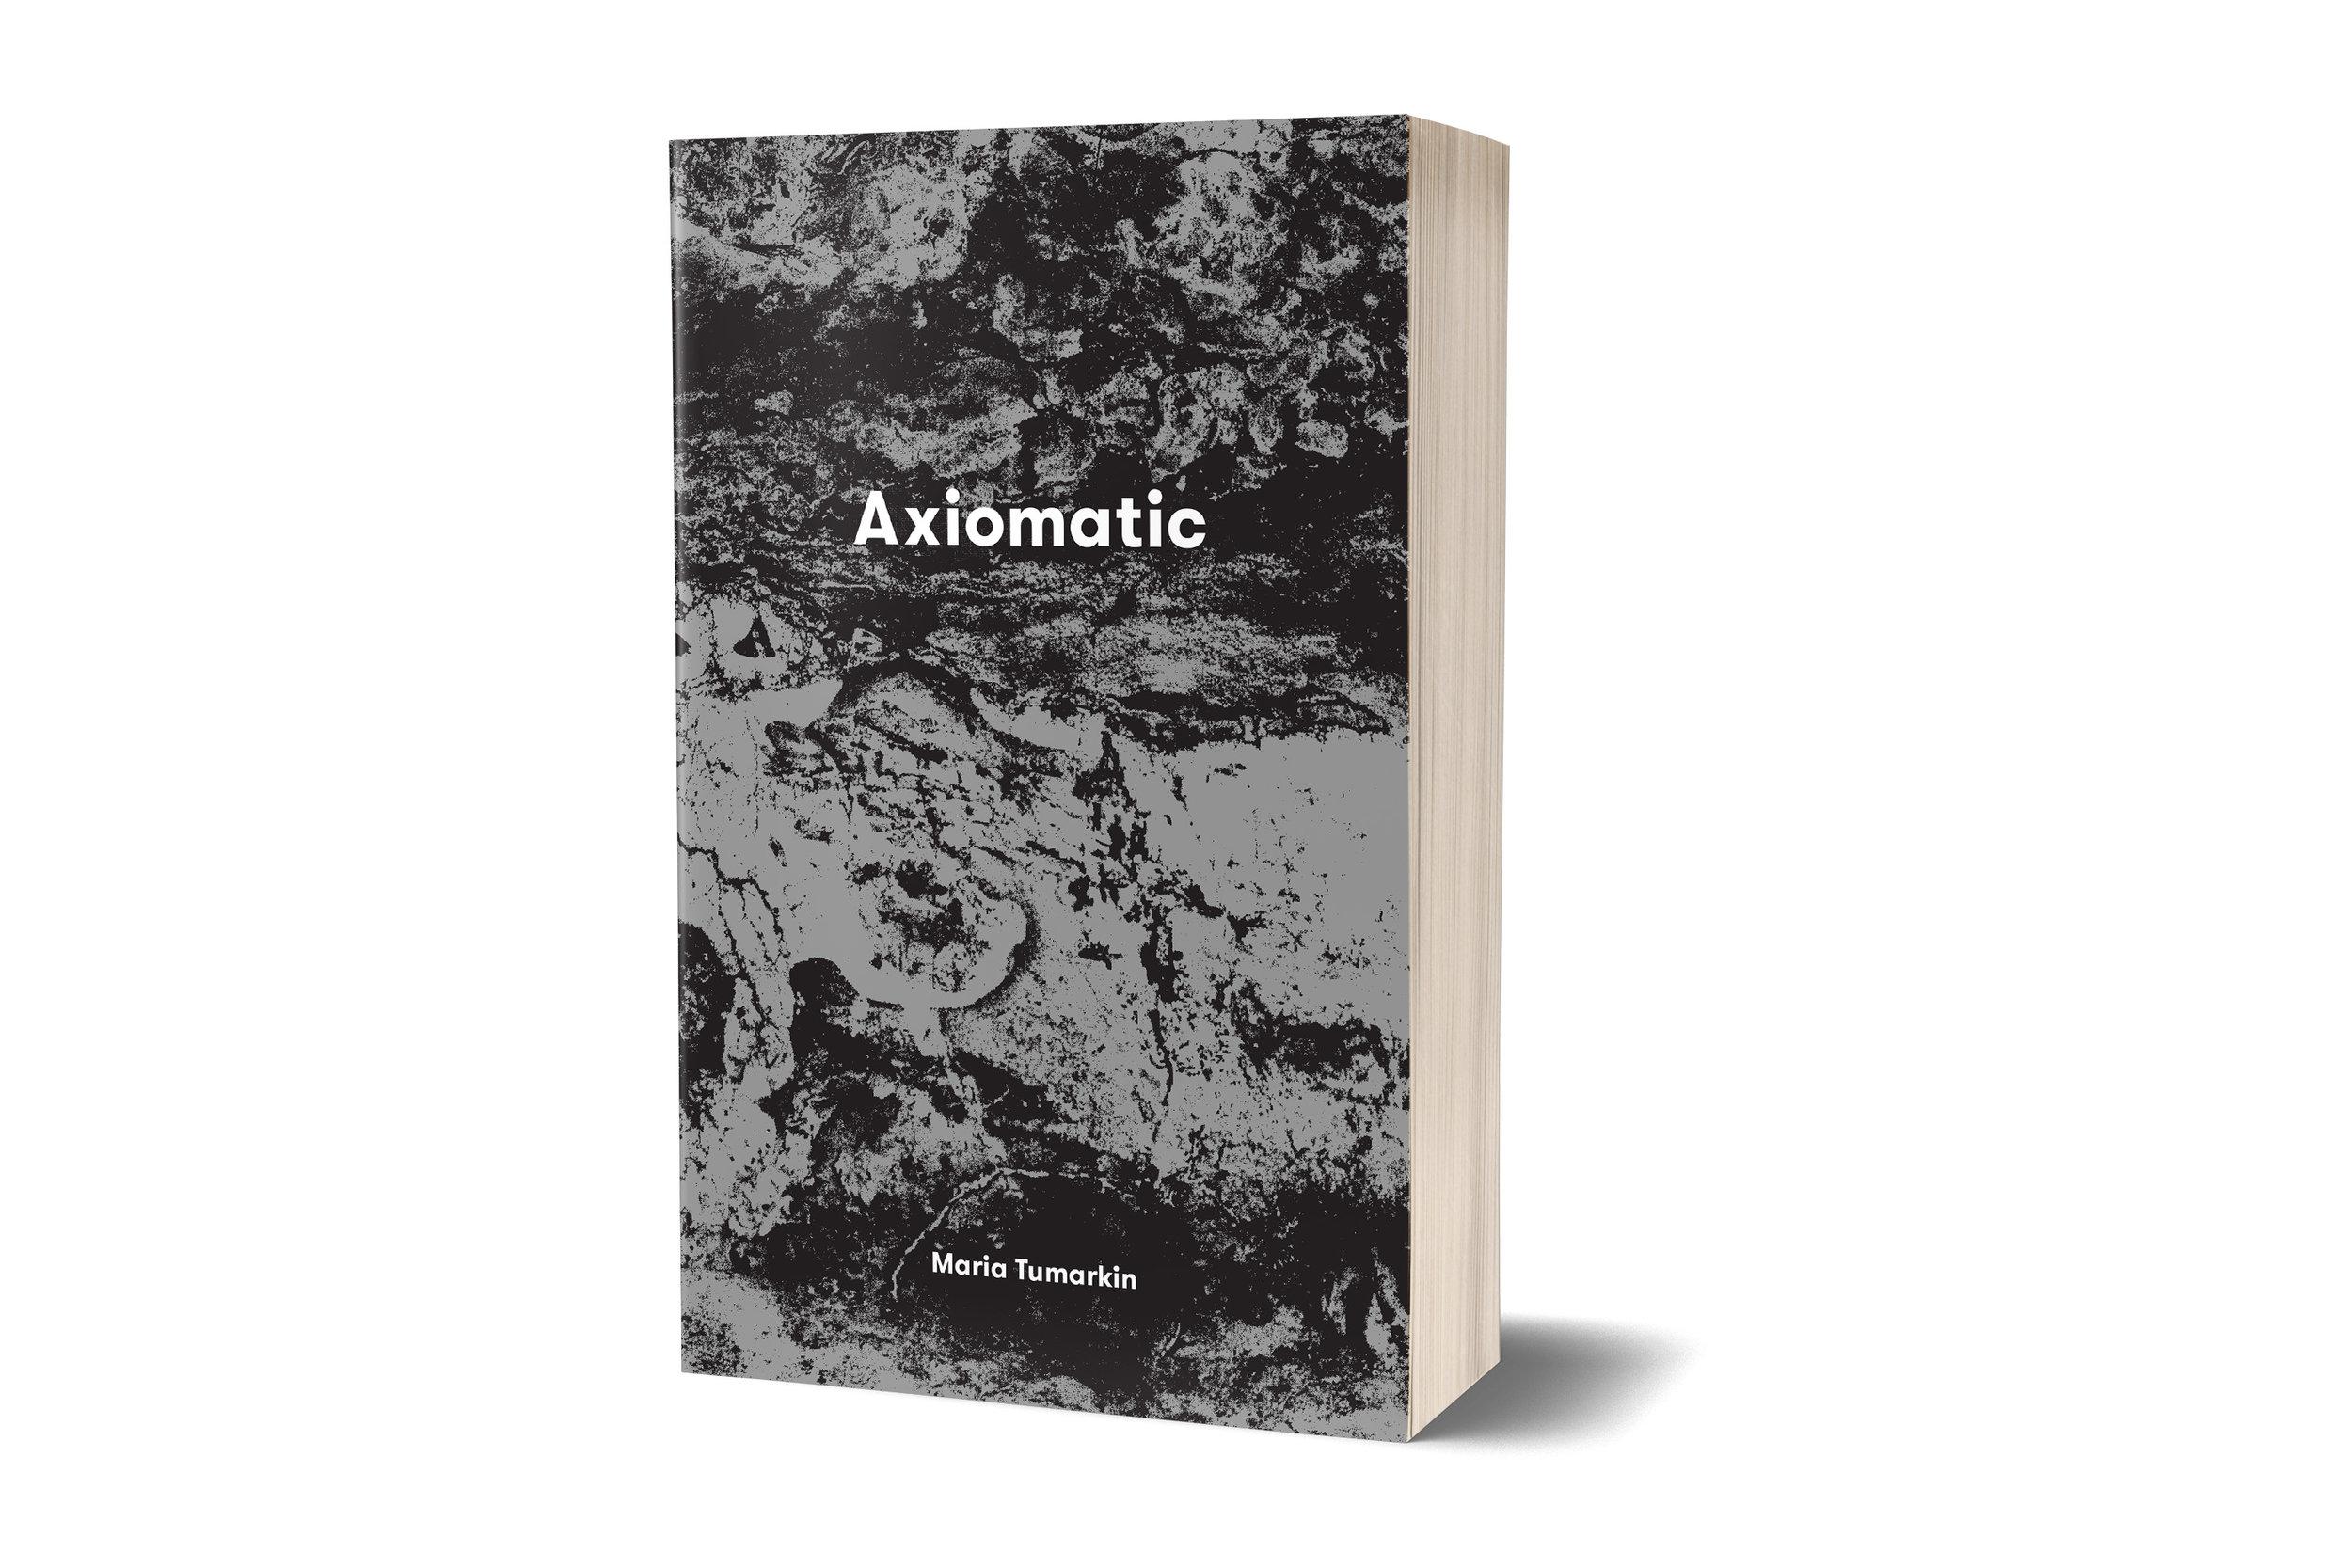 Axiomatic_3D.jpg